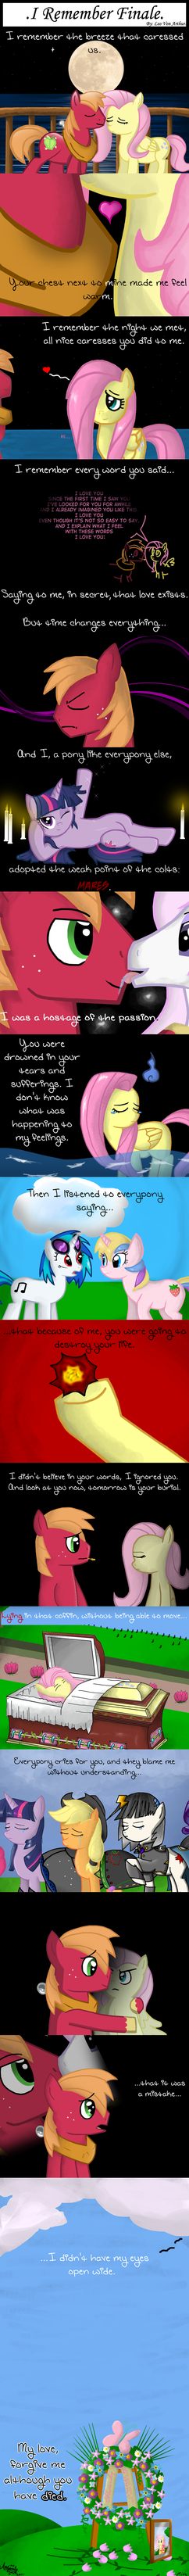 .Comic 4: My Little Pony: I Remember FINALE. by ZSparkonequus